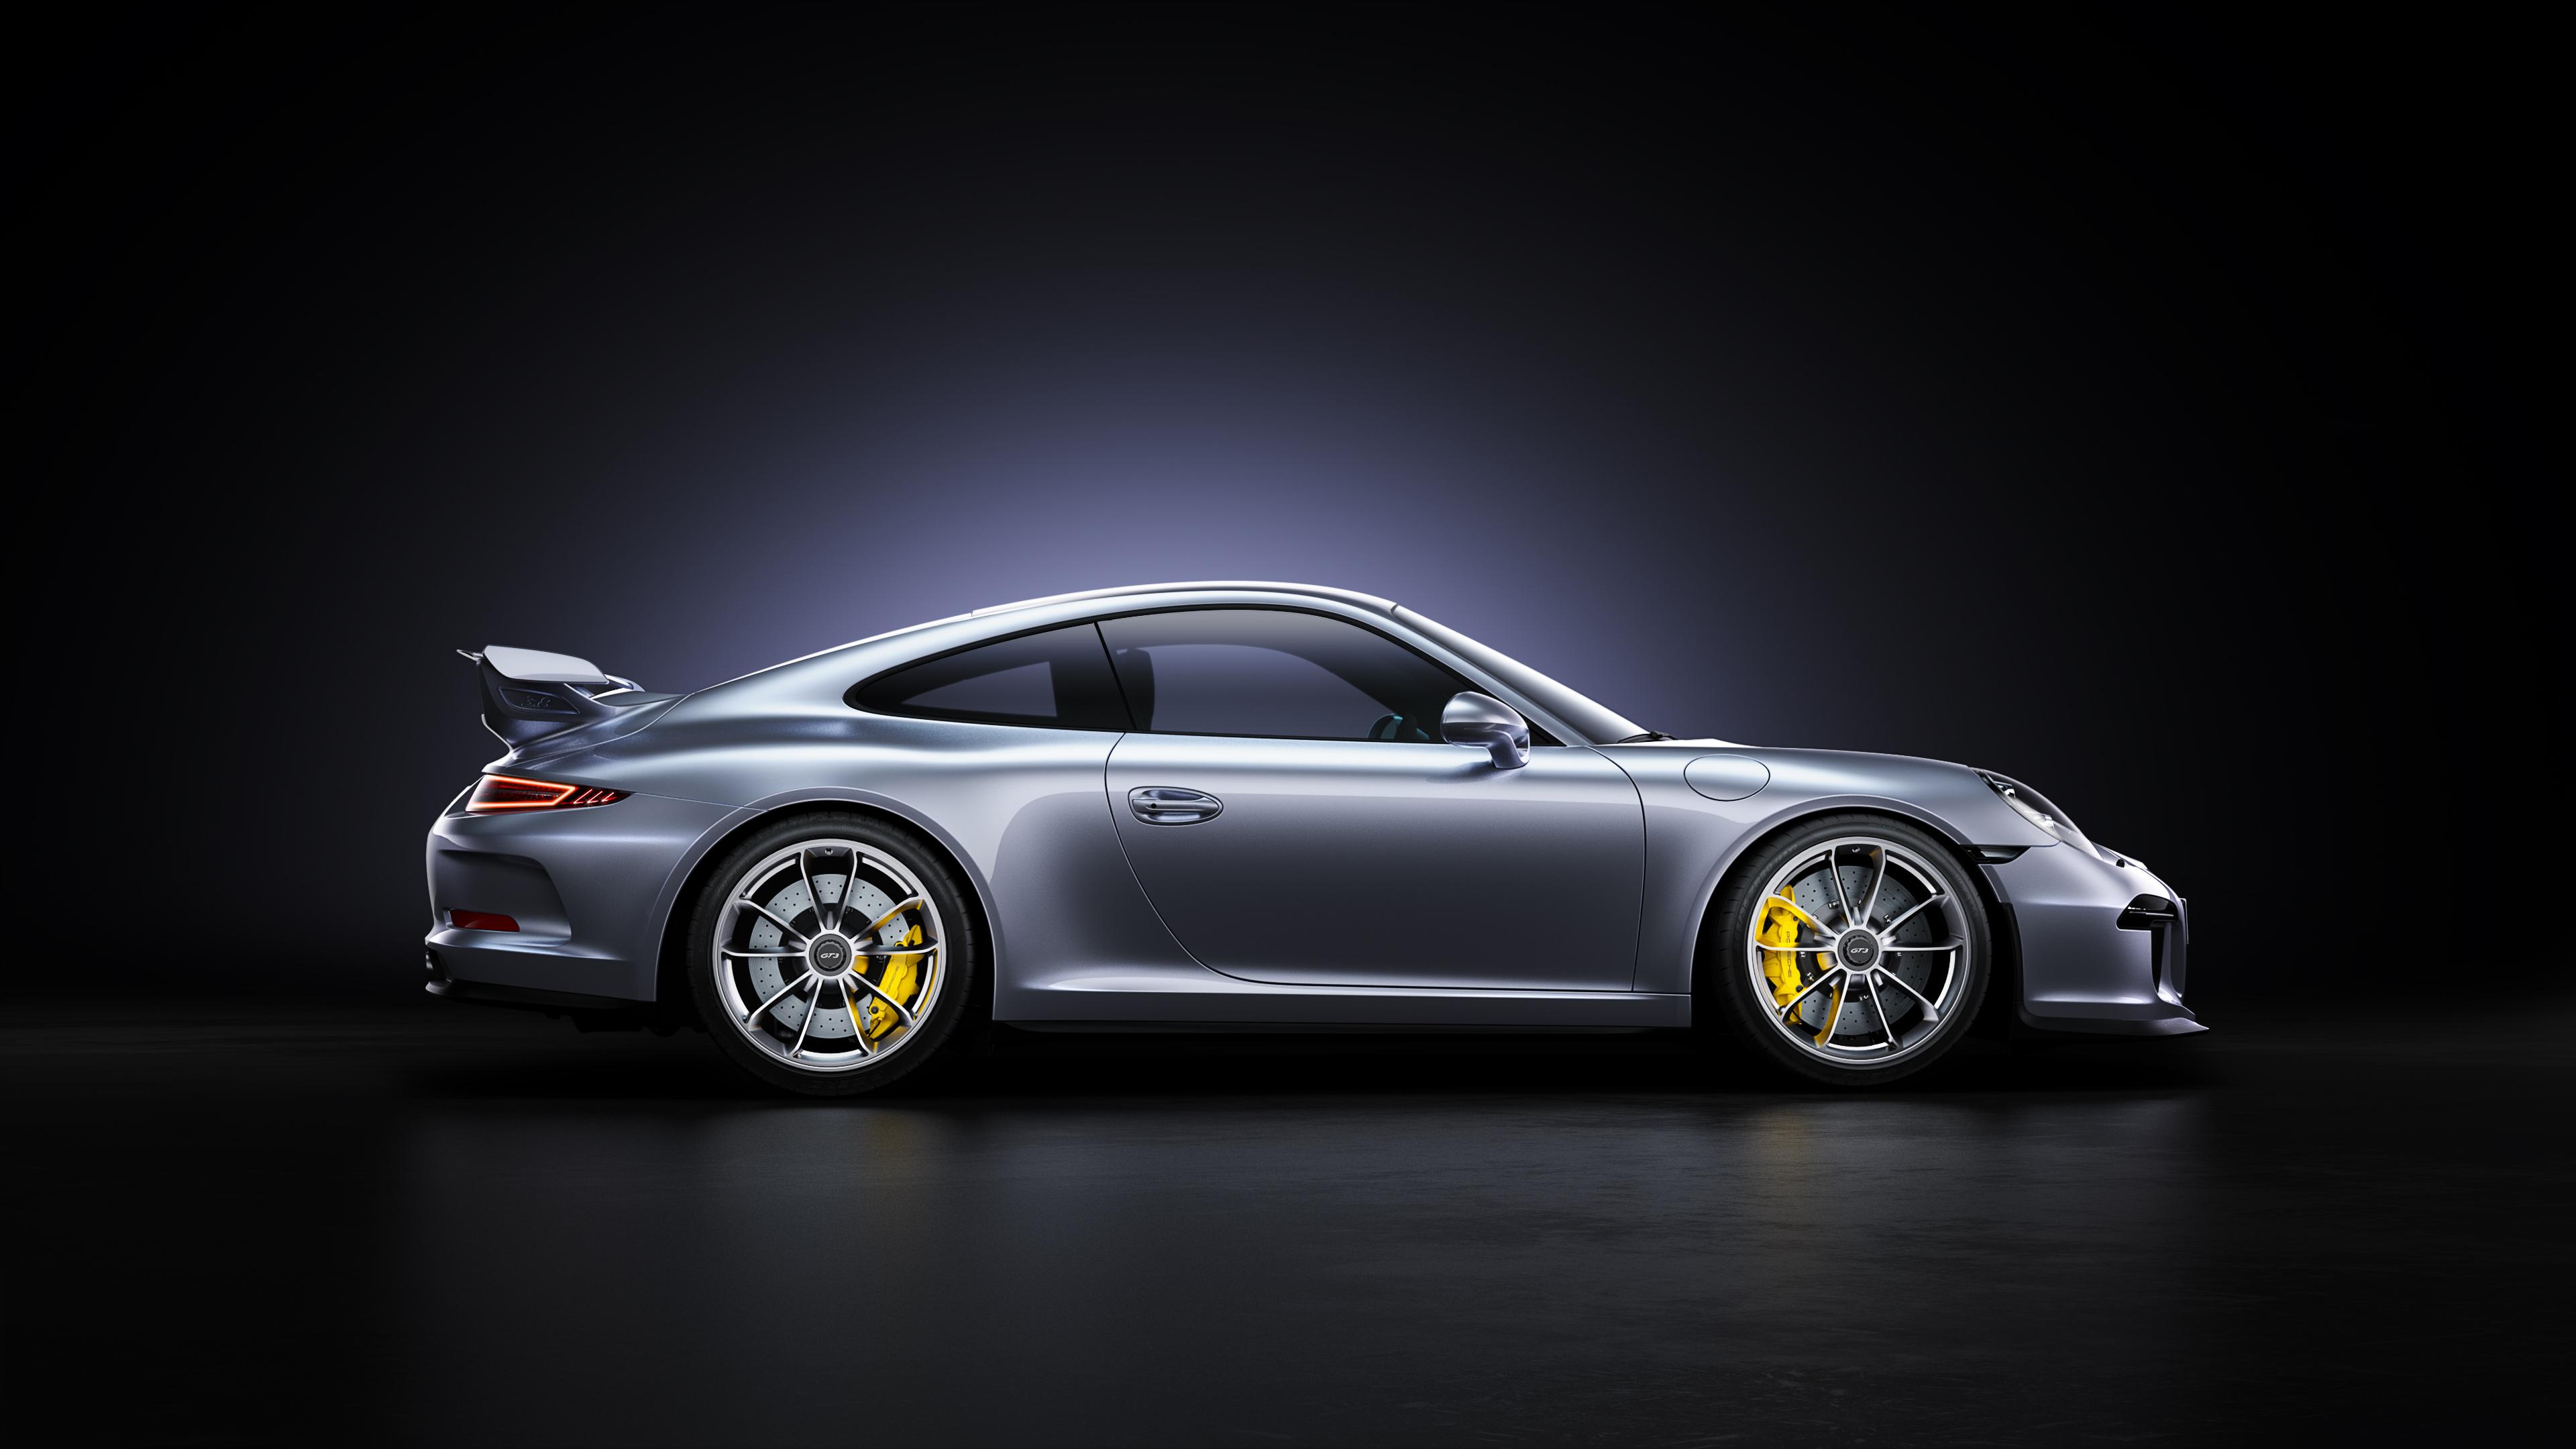 4k Porche Carrera Gt Wallpaper: Porsche 911 GT3 4k, HD Cars, 4k Wallpapers, Images